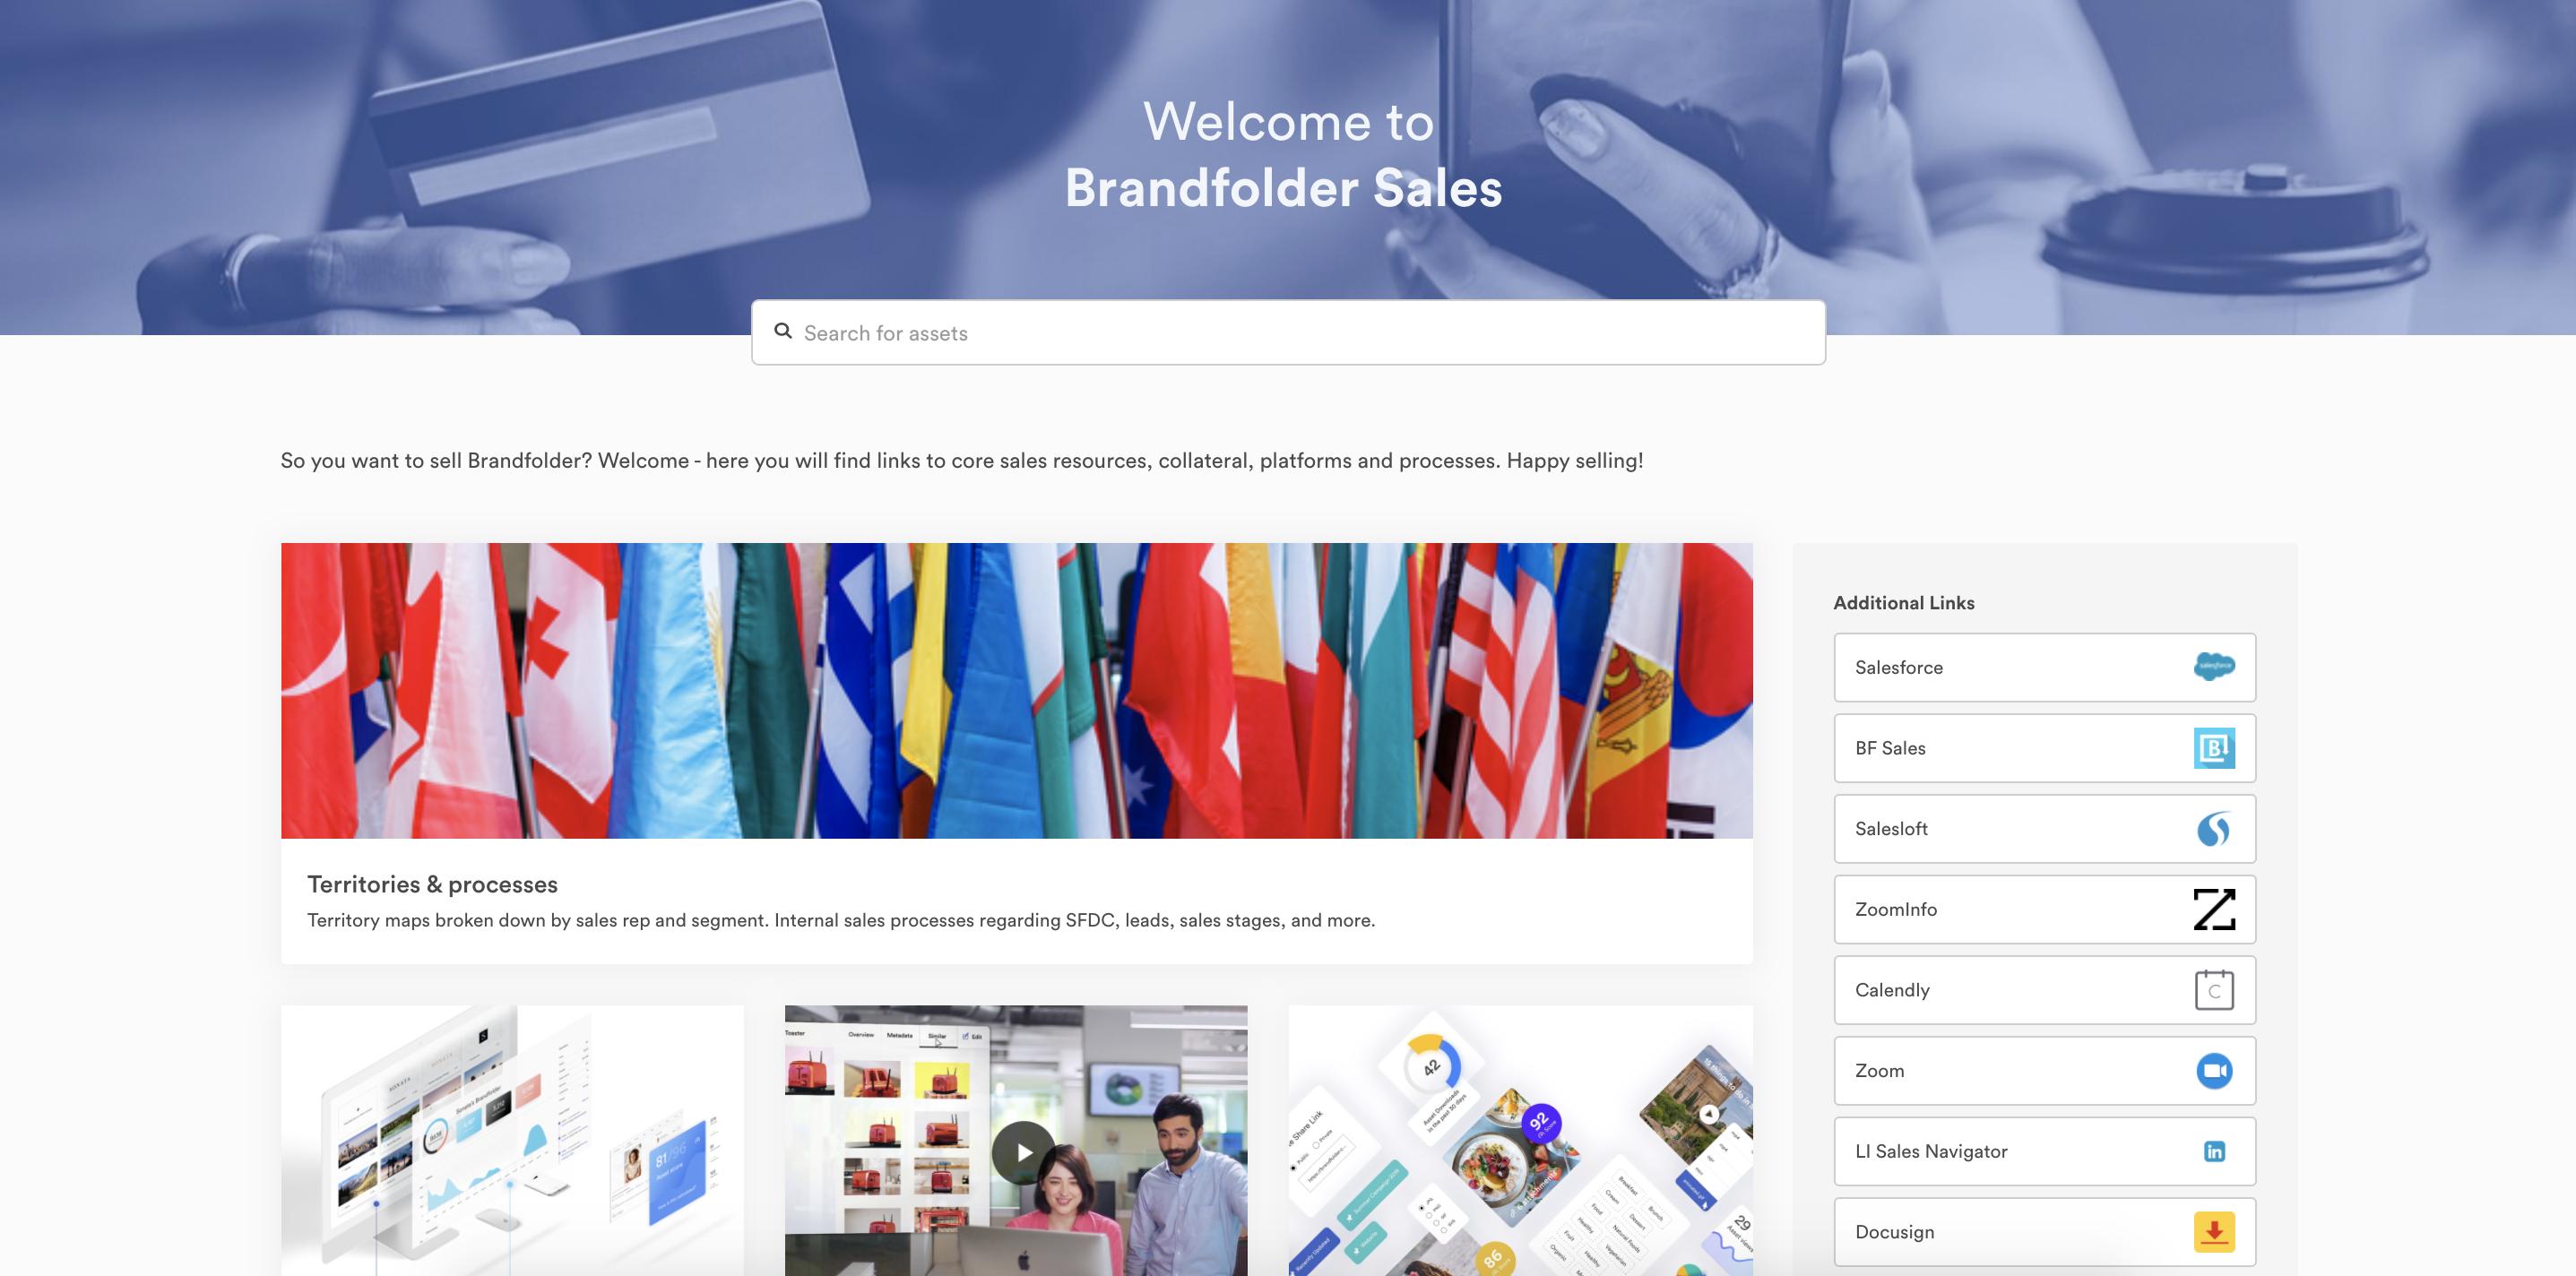 Brandfolder Sales Portal